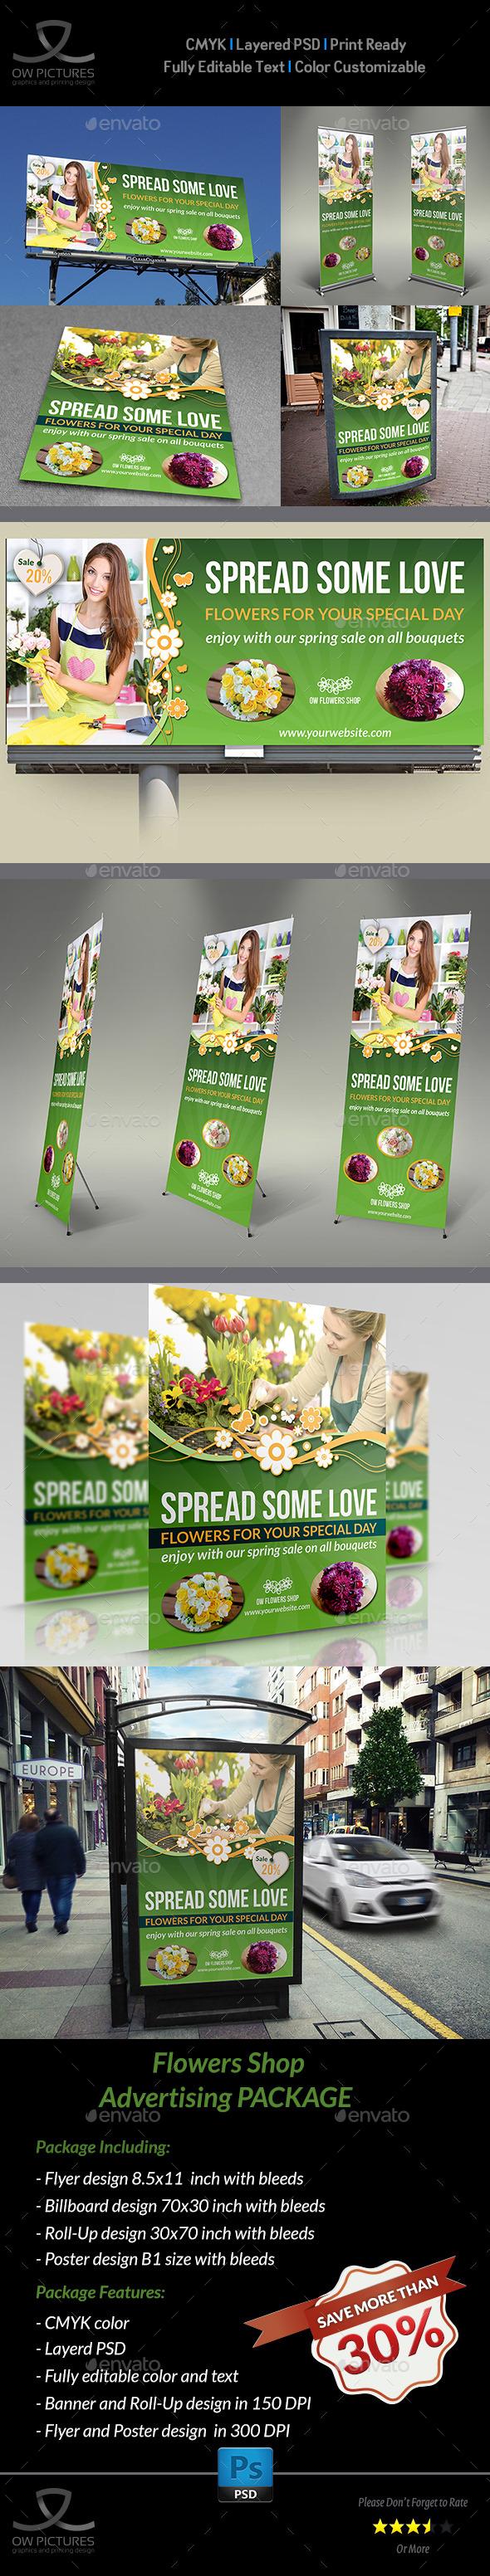 GraphicRiver Flowers Shop Service Advertising Bundle 11357388